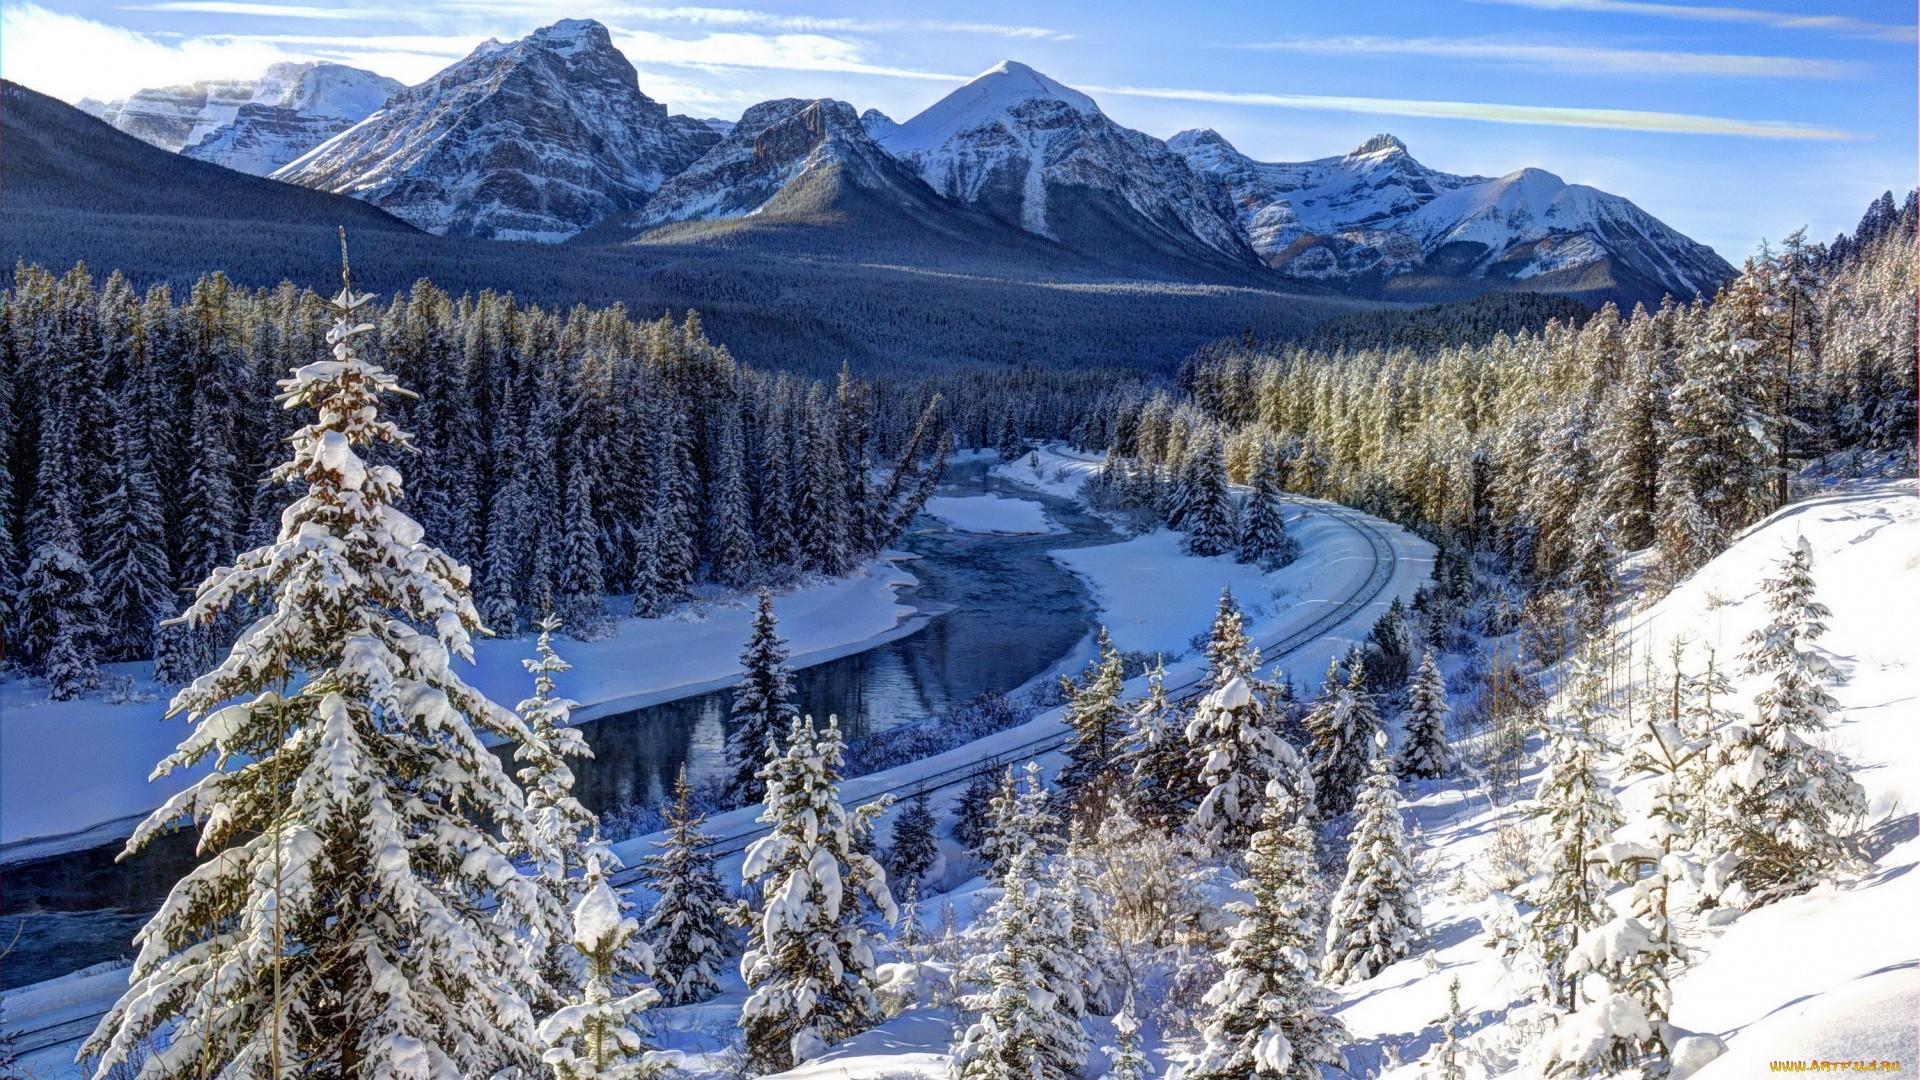 Snow Mountain hd wallpaper download